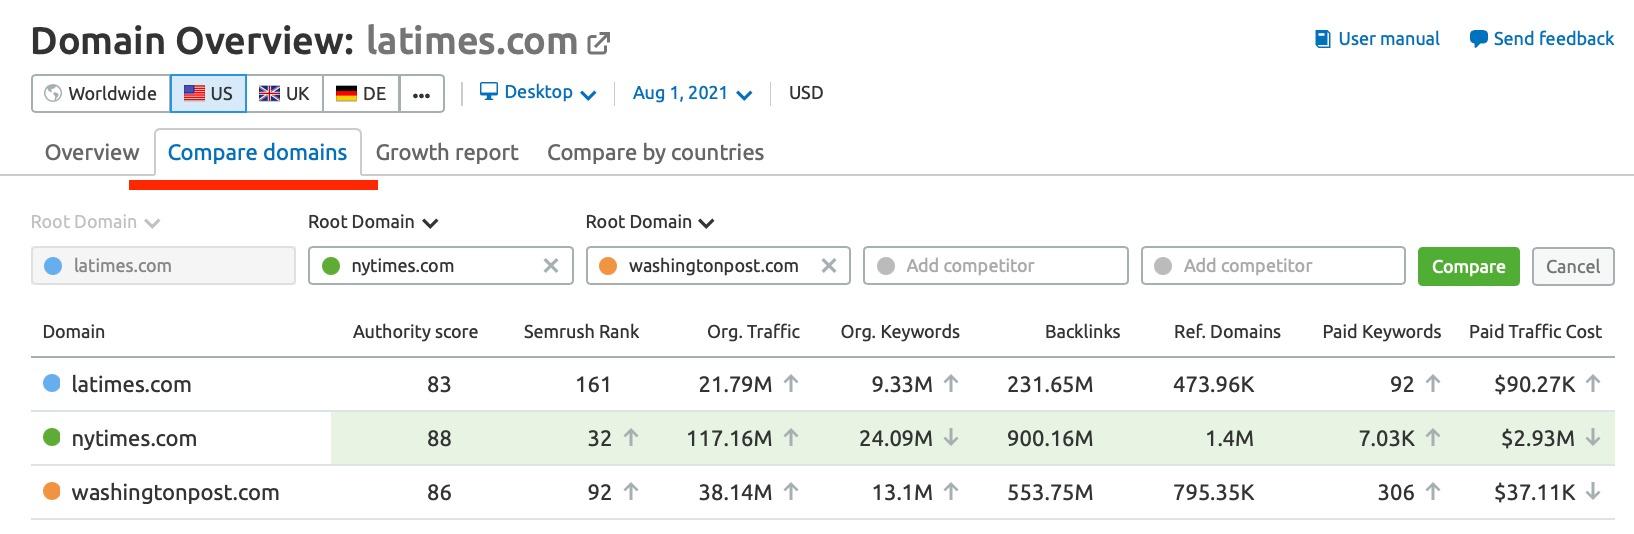 compare domains